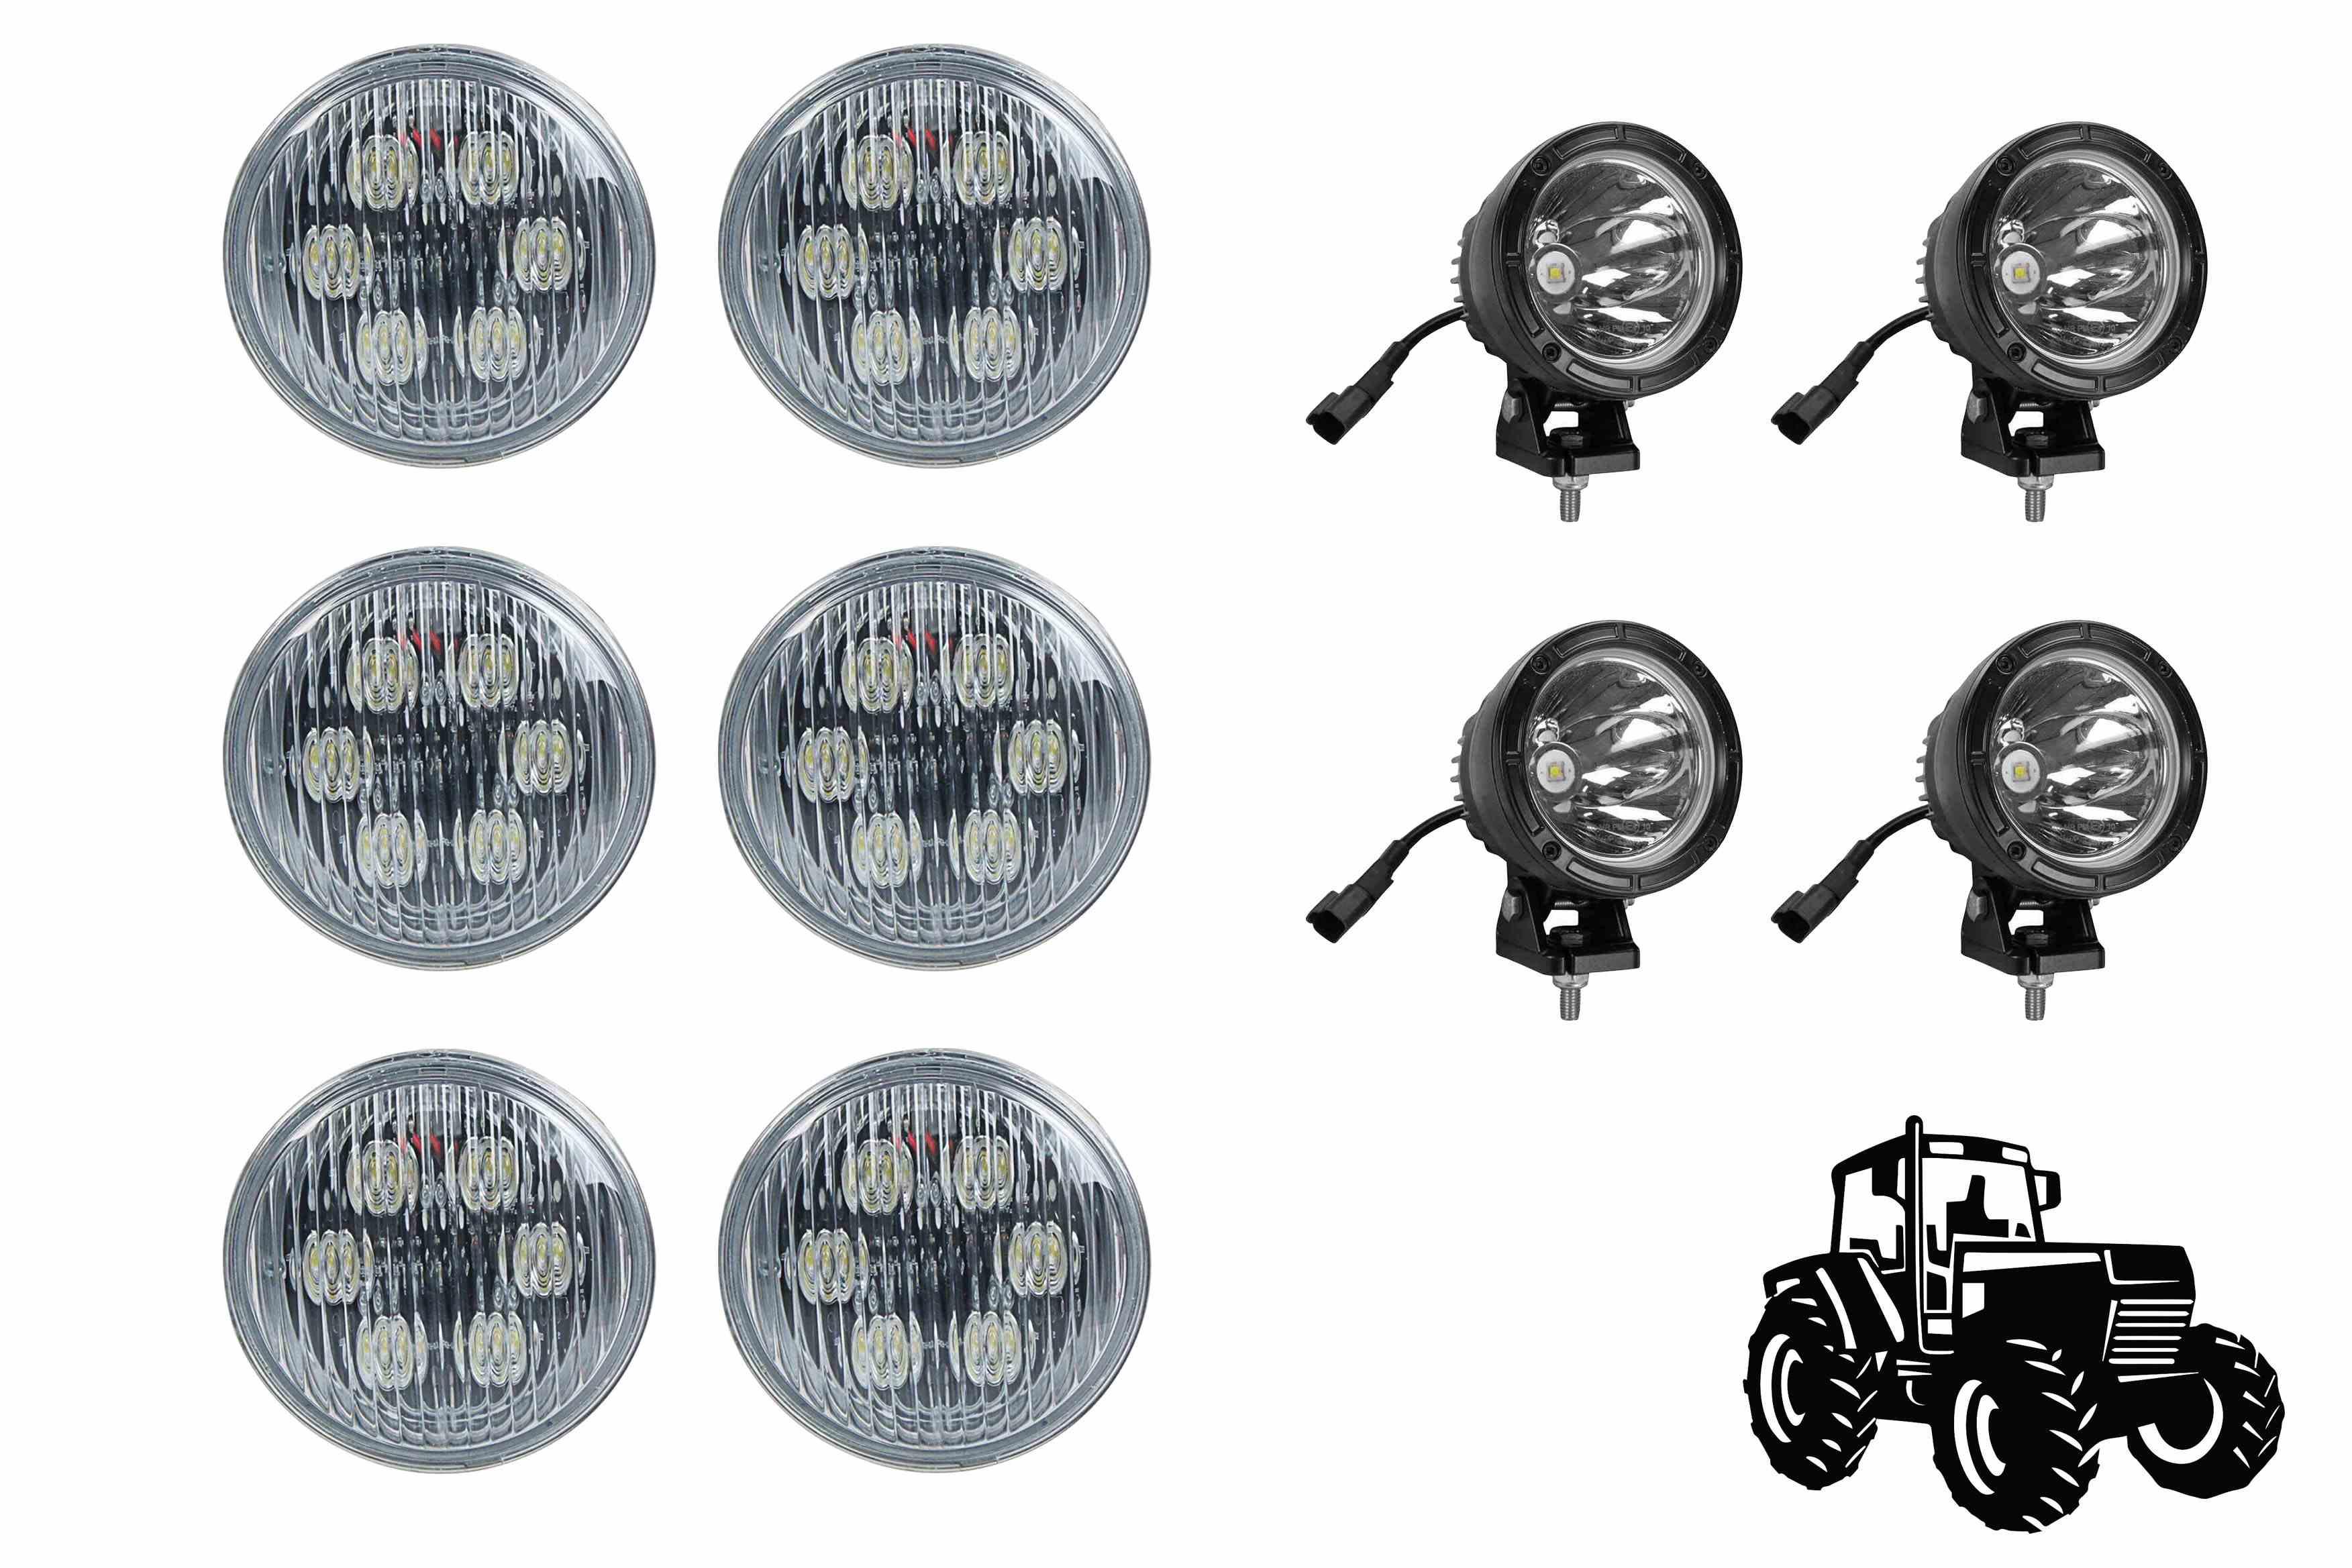 LED Cab Light Upgrade Kit for John Deere 4230 Tractors